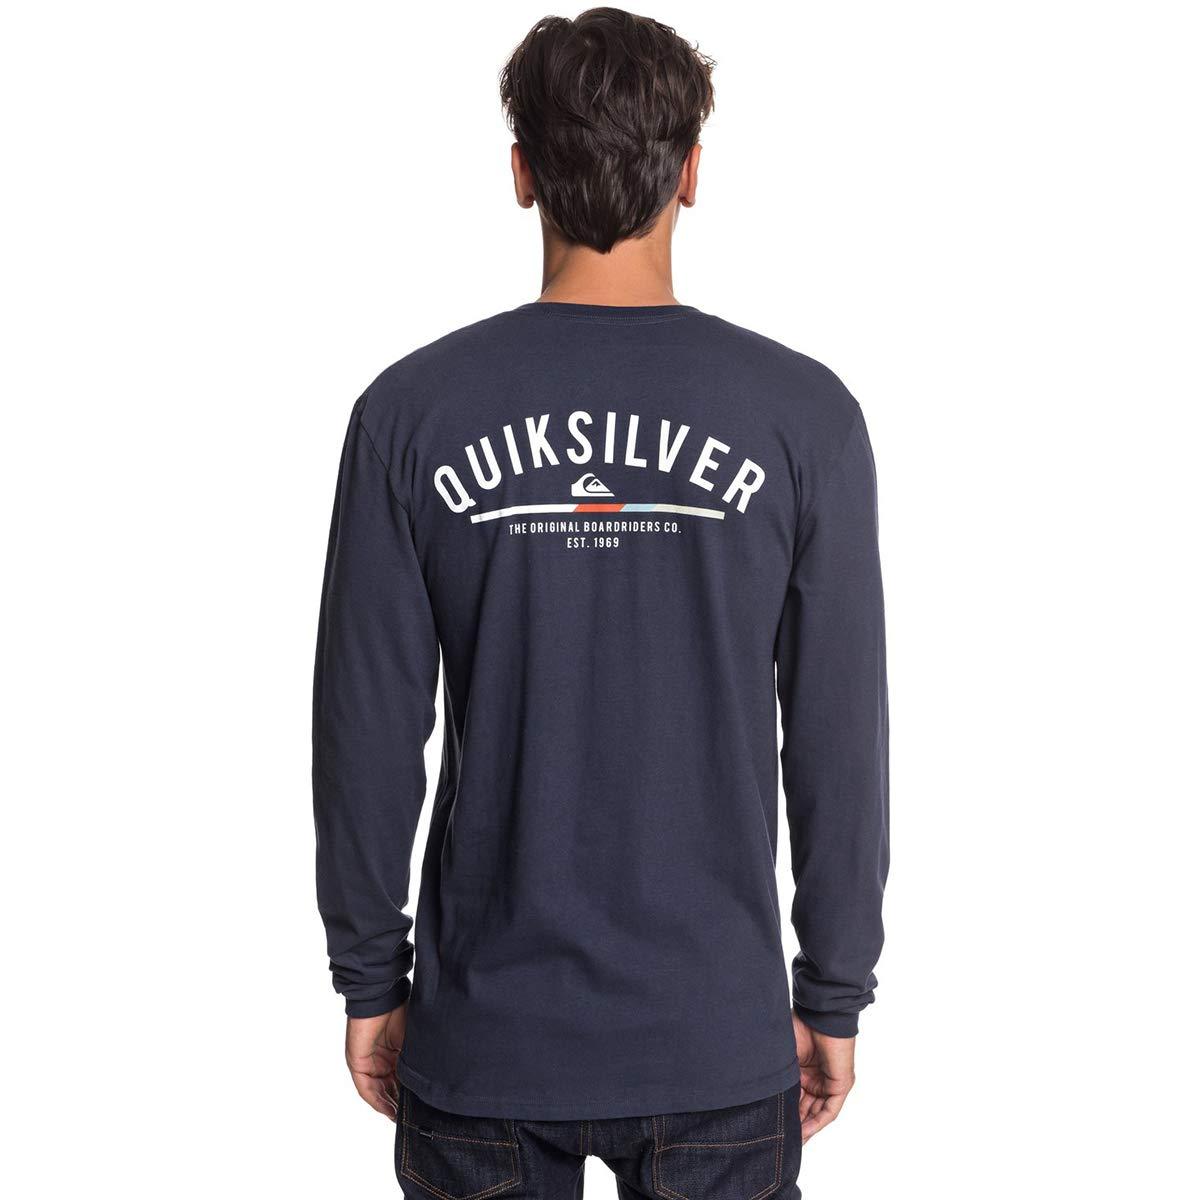 Quiksilver Masculino Simples Cor Camiseta Manga Longa-escolha ... 434516f17c